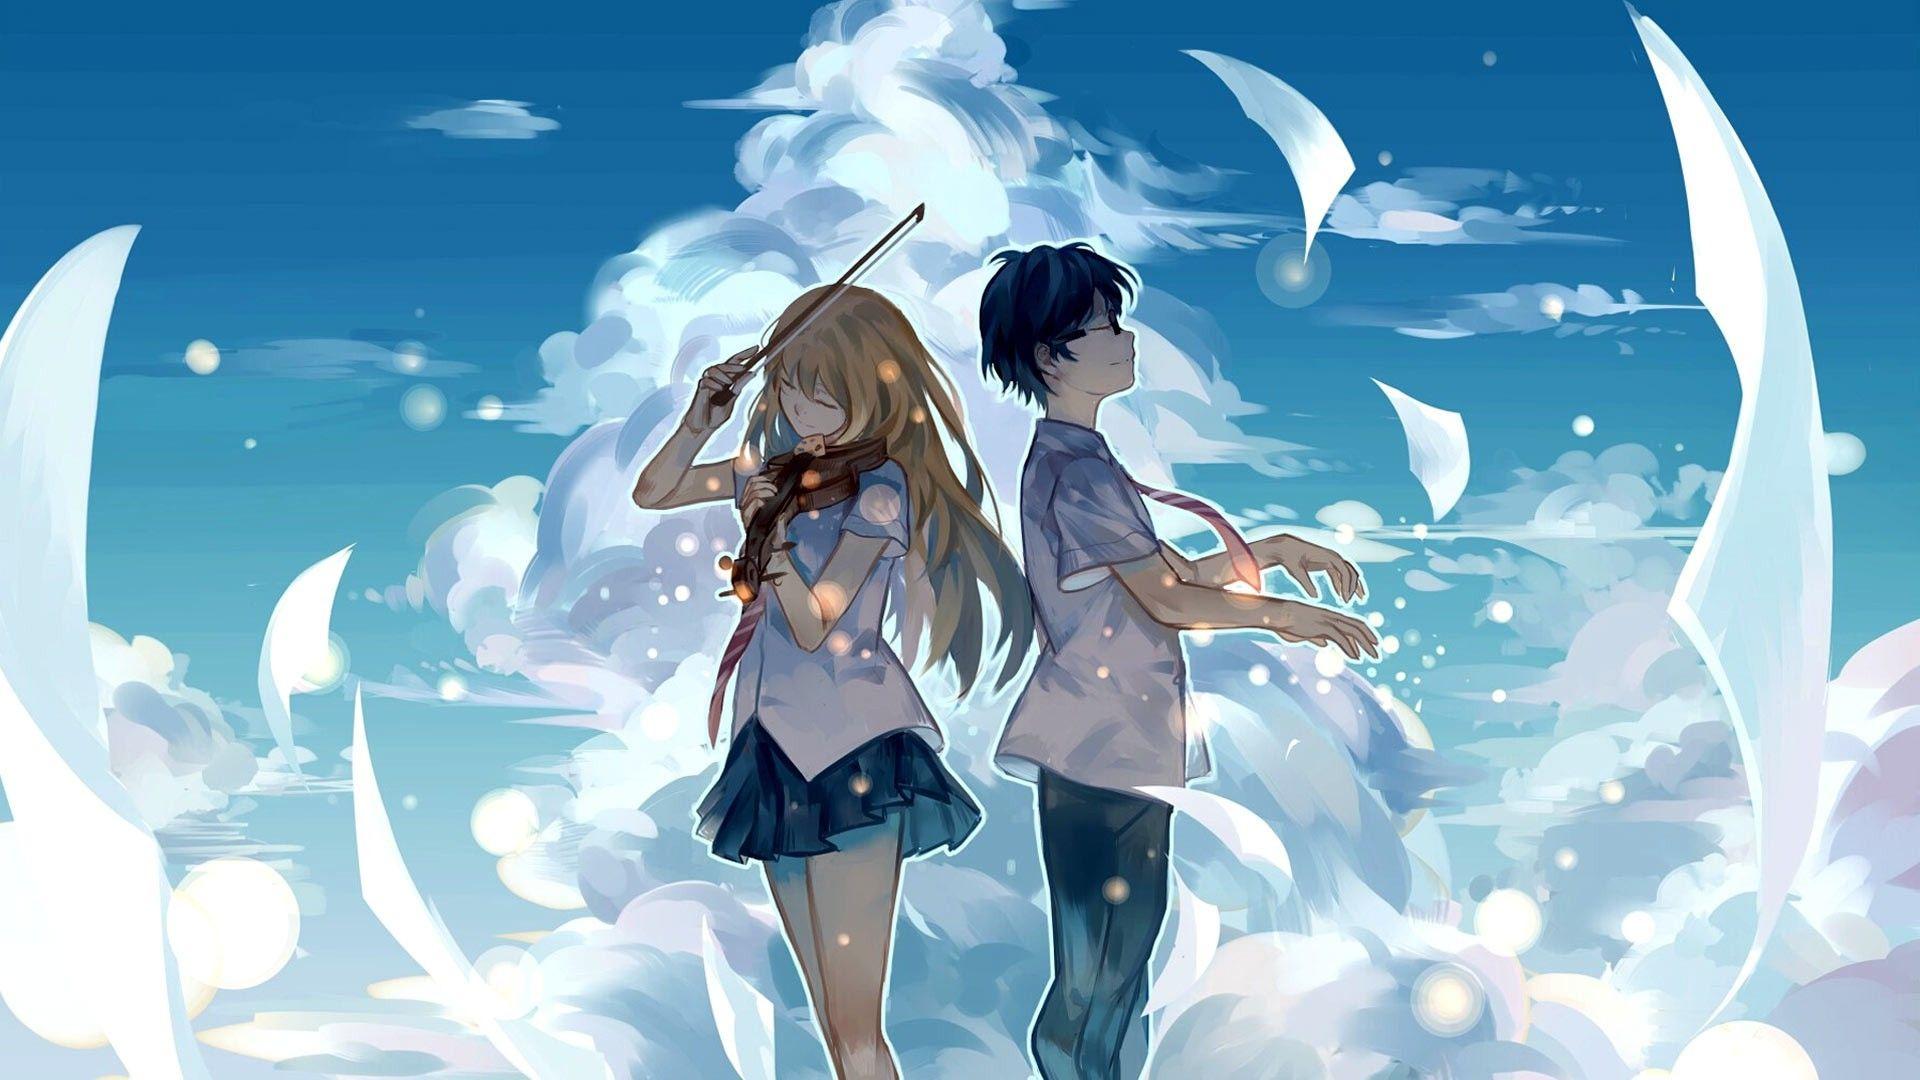 Gambar Anime Romantis Wallpaper Top Anime Wallpaper In 2020 Hd Anime Wallpapers Anime Anime Wallpaper